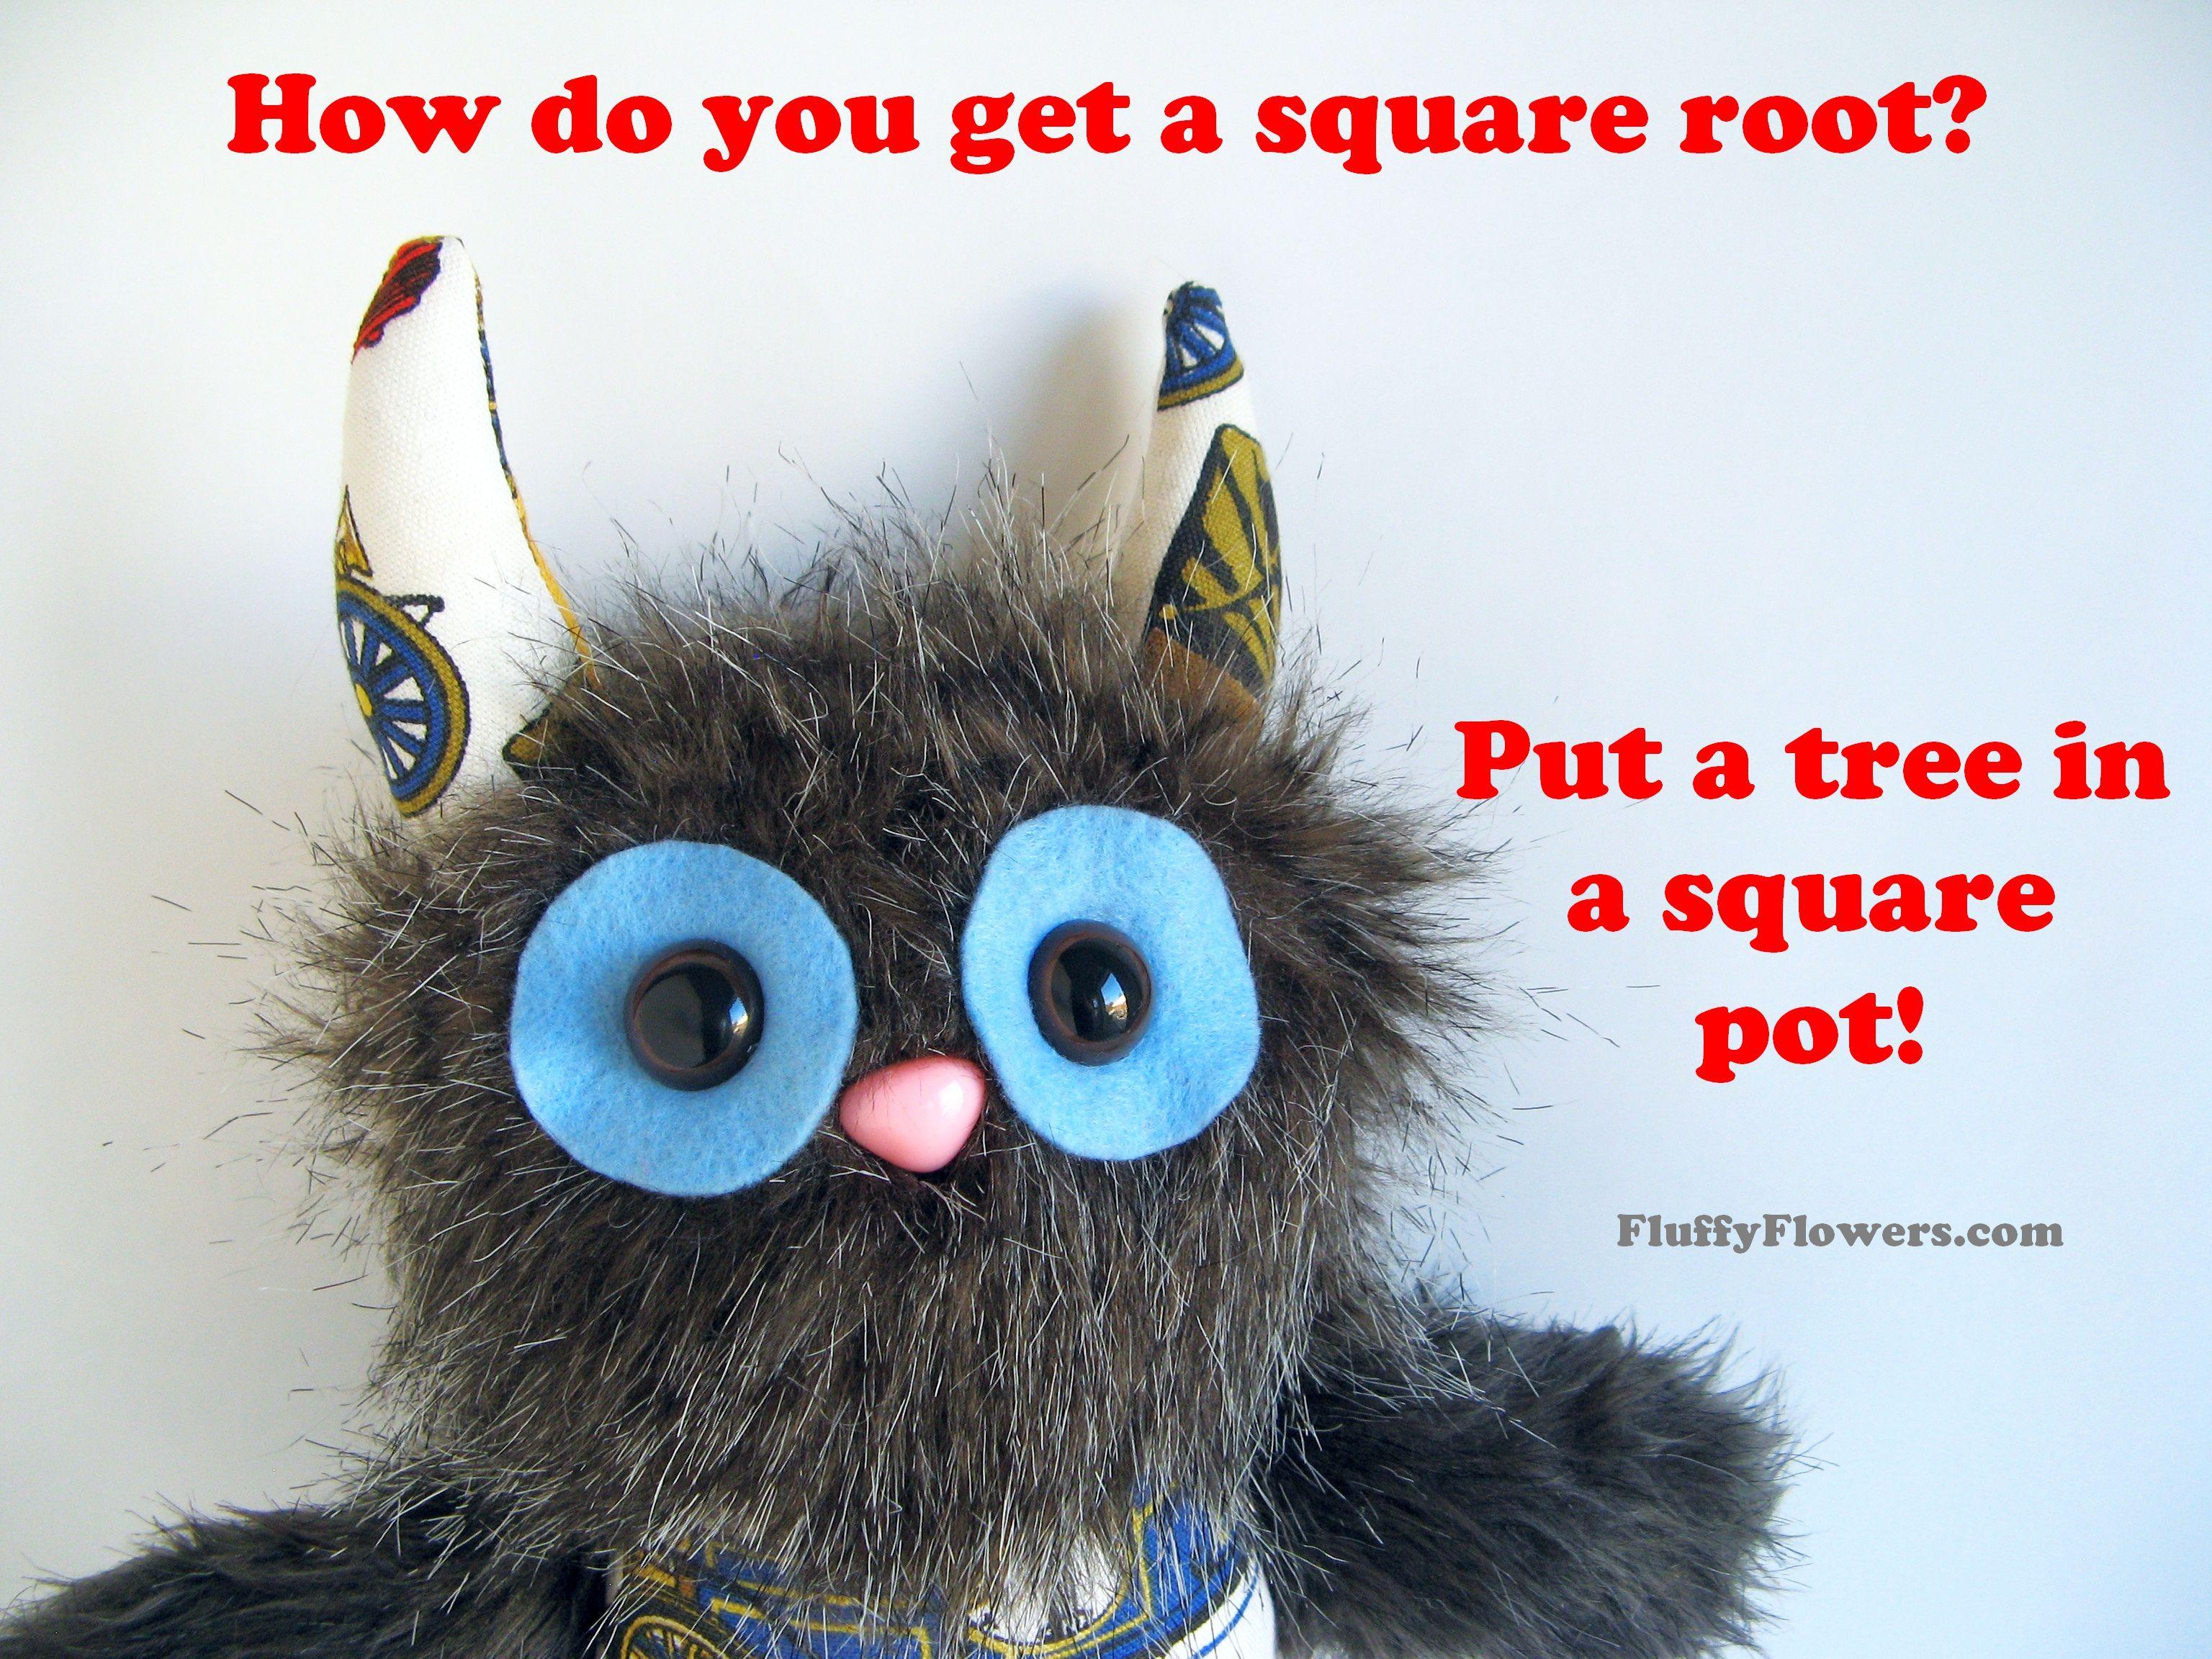 cute & clean tree flowerpot gardening joke for children